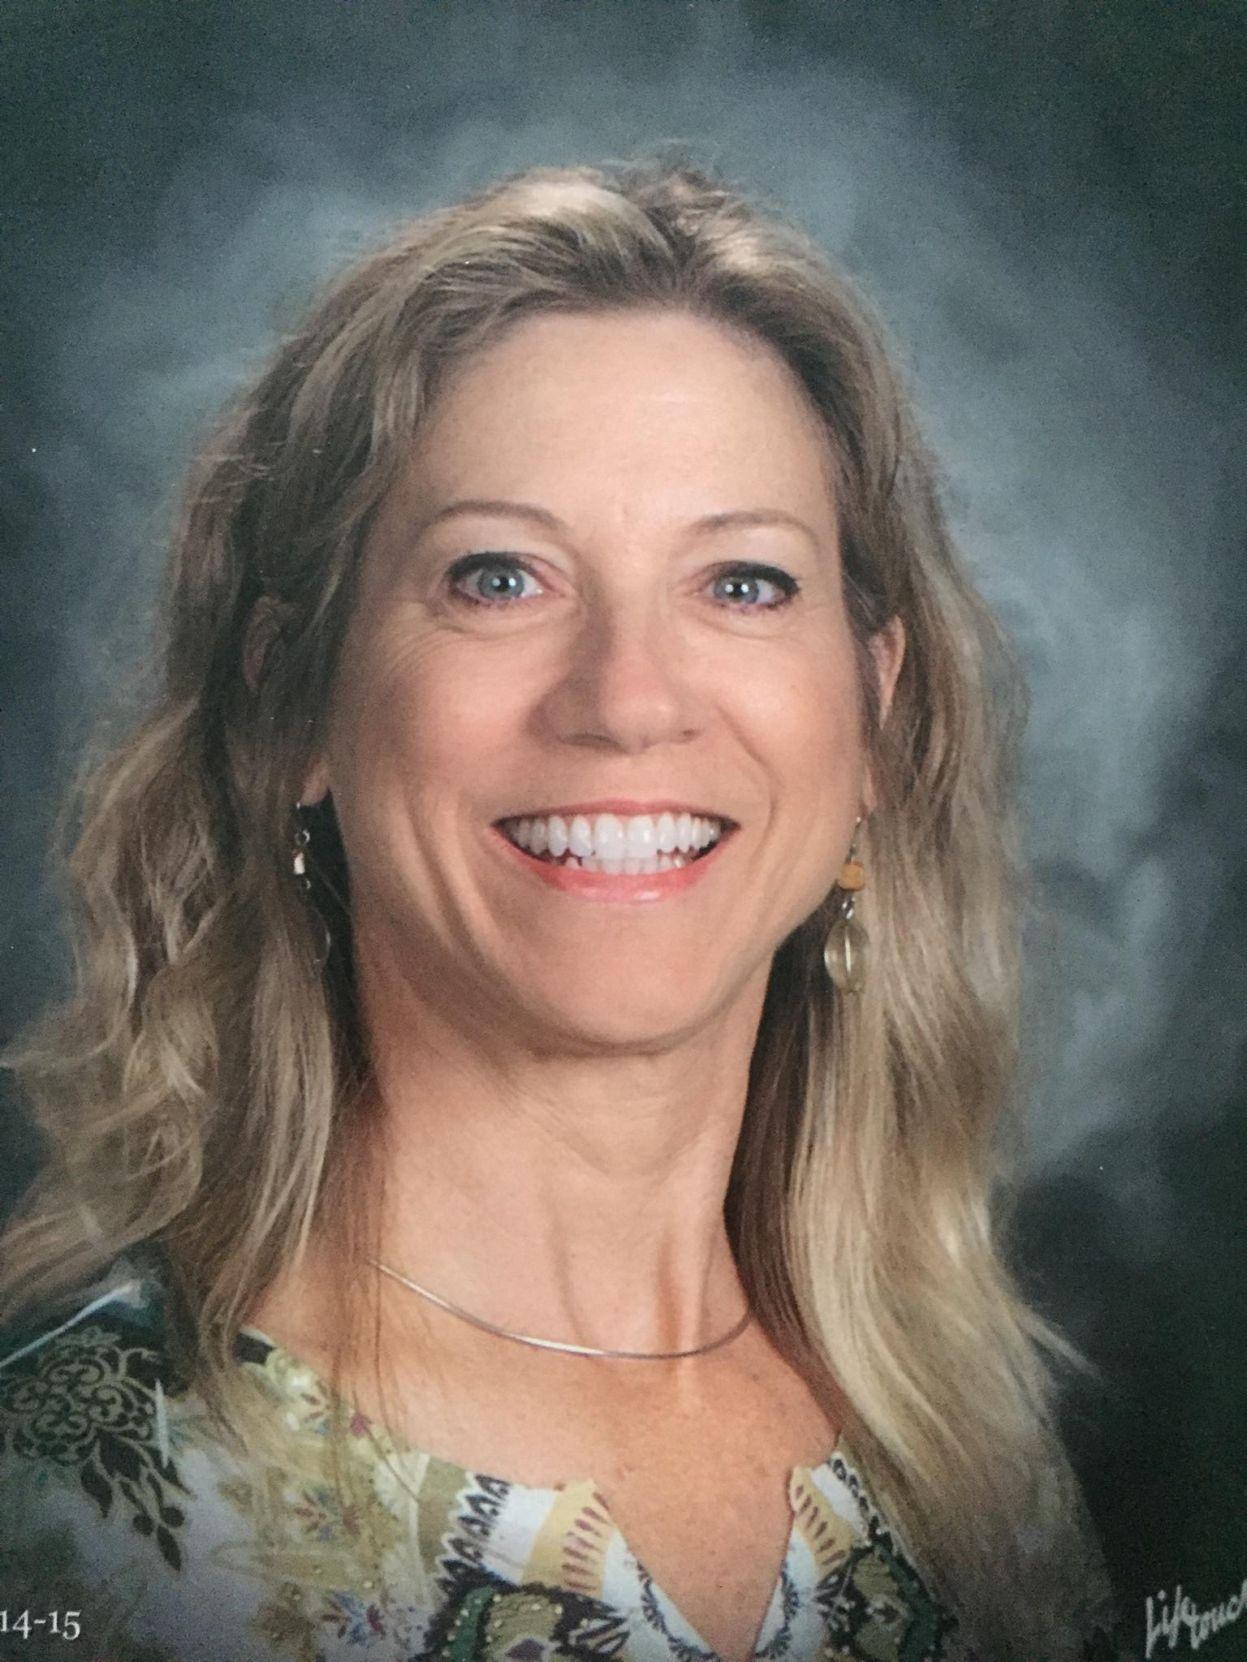 Forum on this topic: Brooke Hogan, judy-cornwell-born-1940/